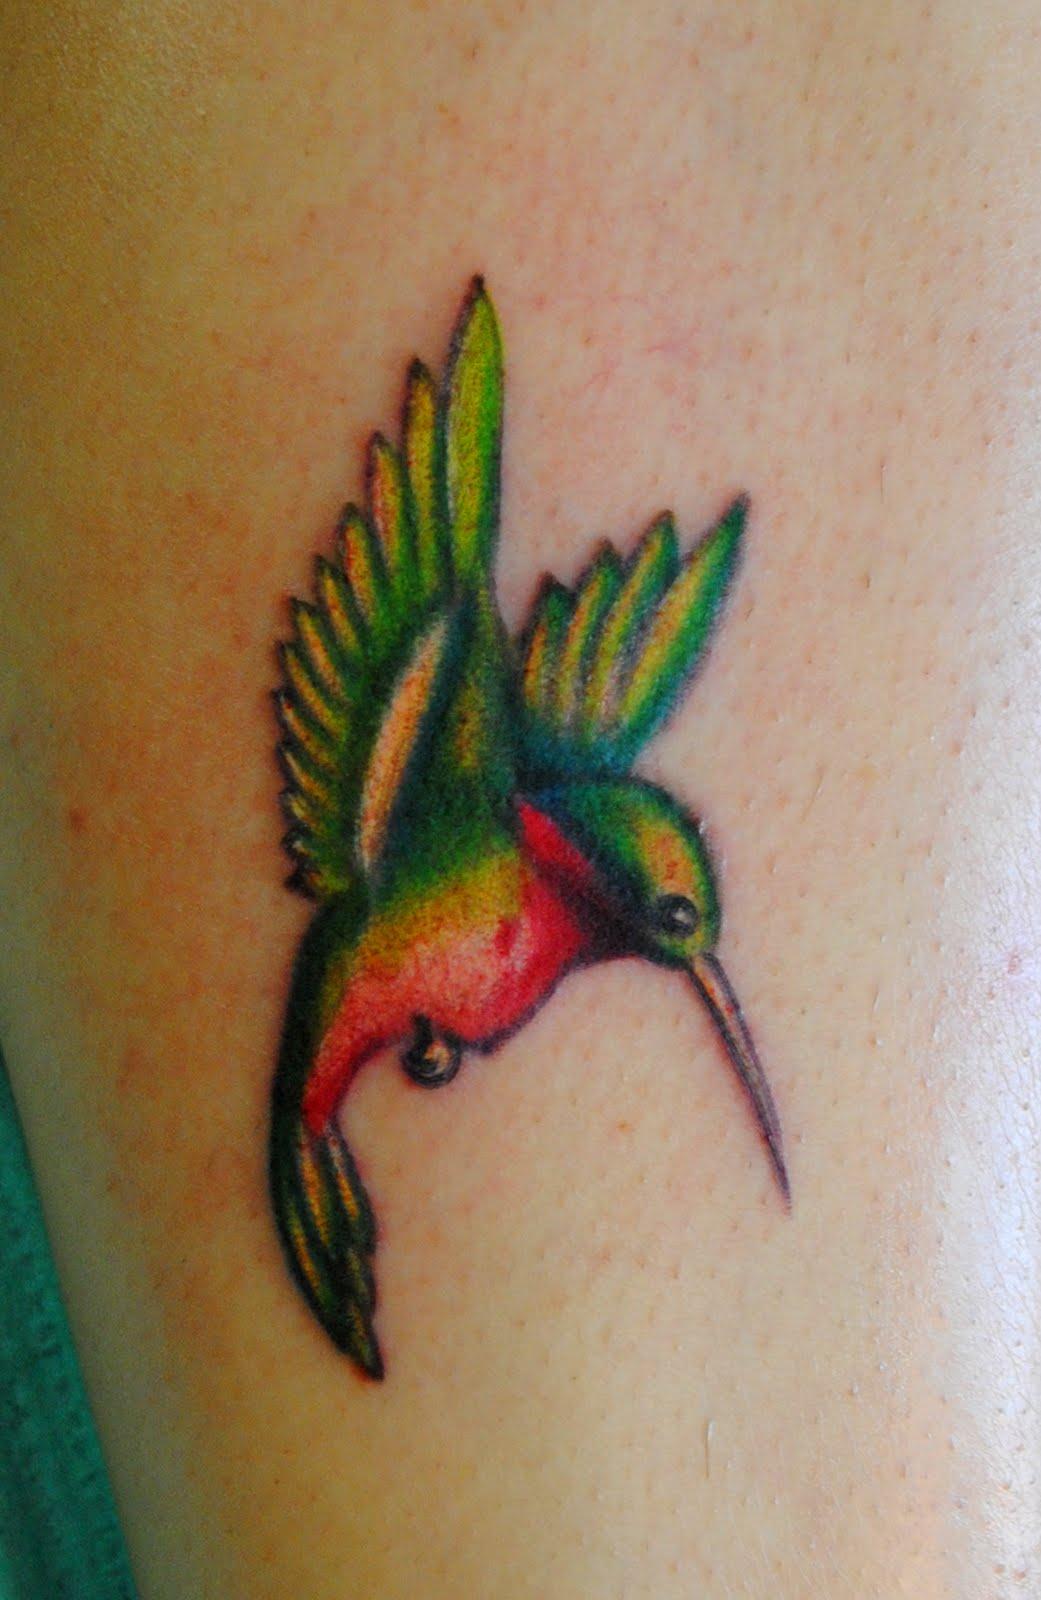 humming bird tattoos images of hummingbird tattoos. Black Bedroom Furniture Sets. Home Design Ideas